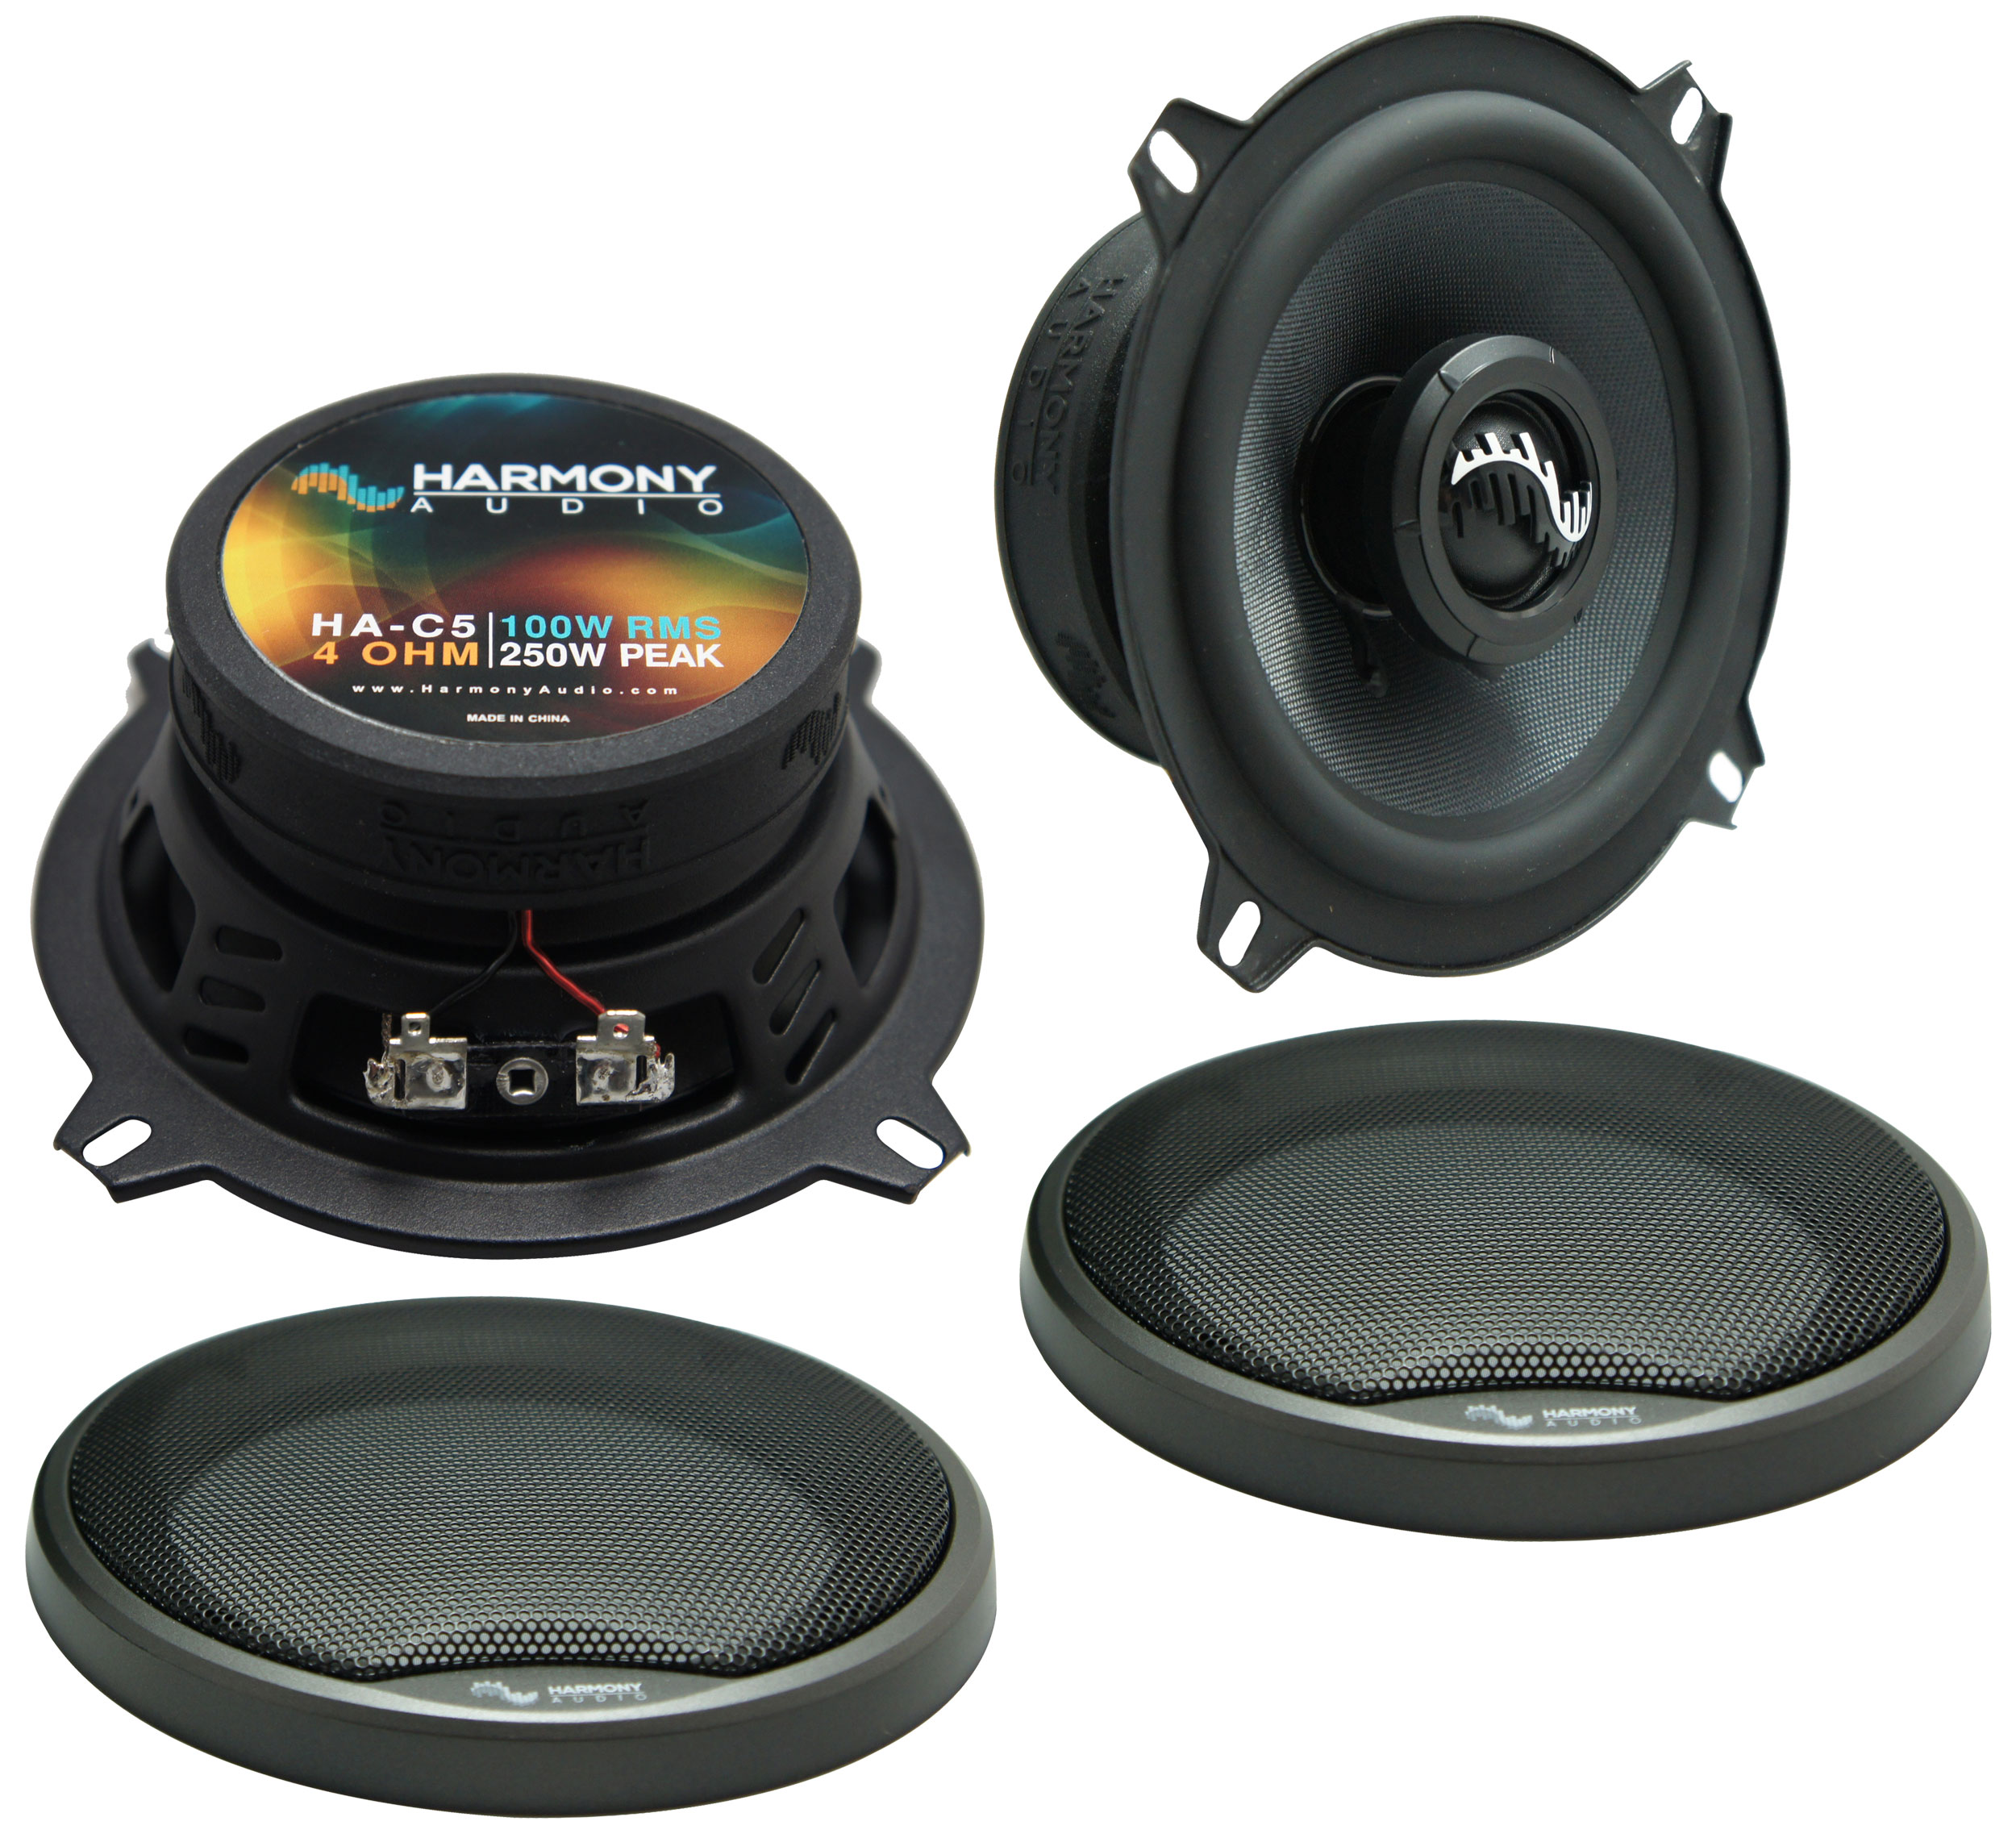 Fits Geo Prizm 1993-1997 Front Door Replacement Speaker Harmony HA-C5 Premium Speakers